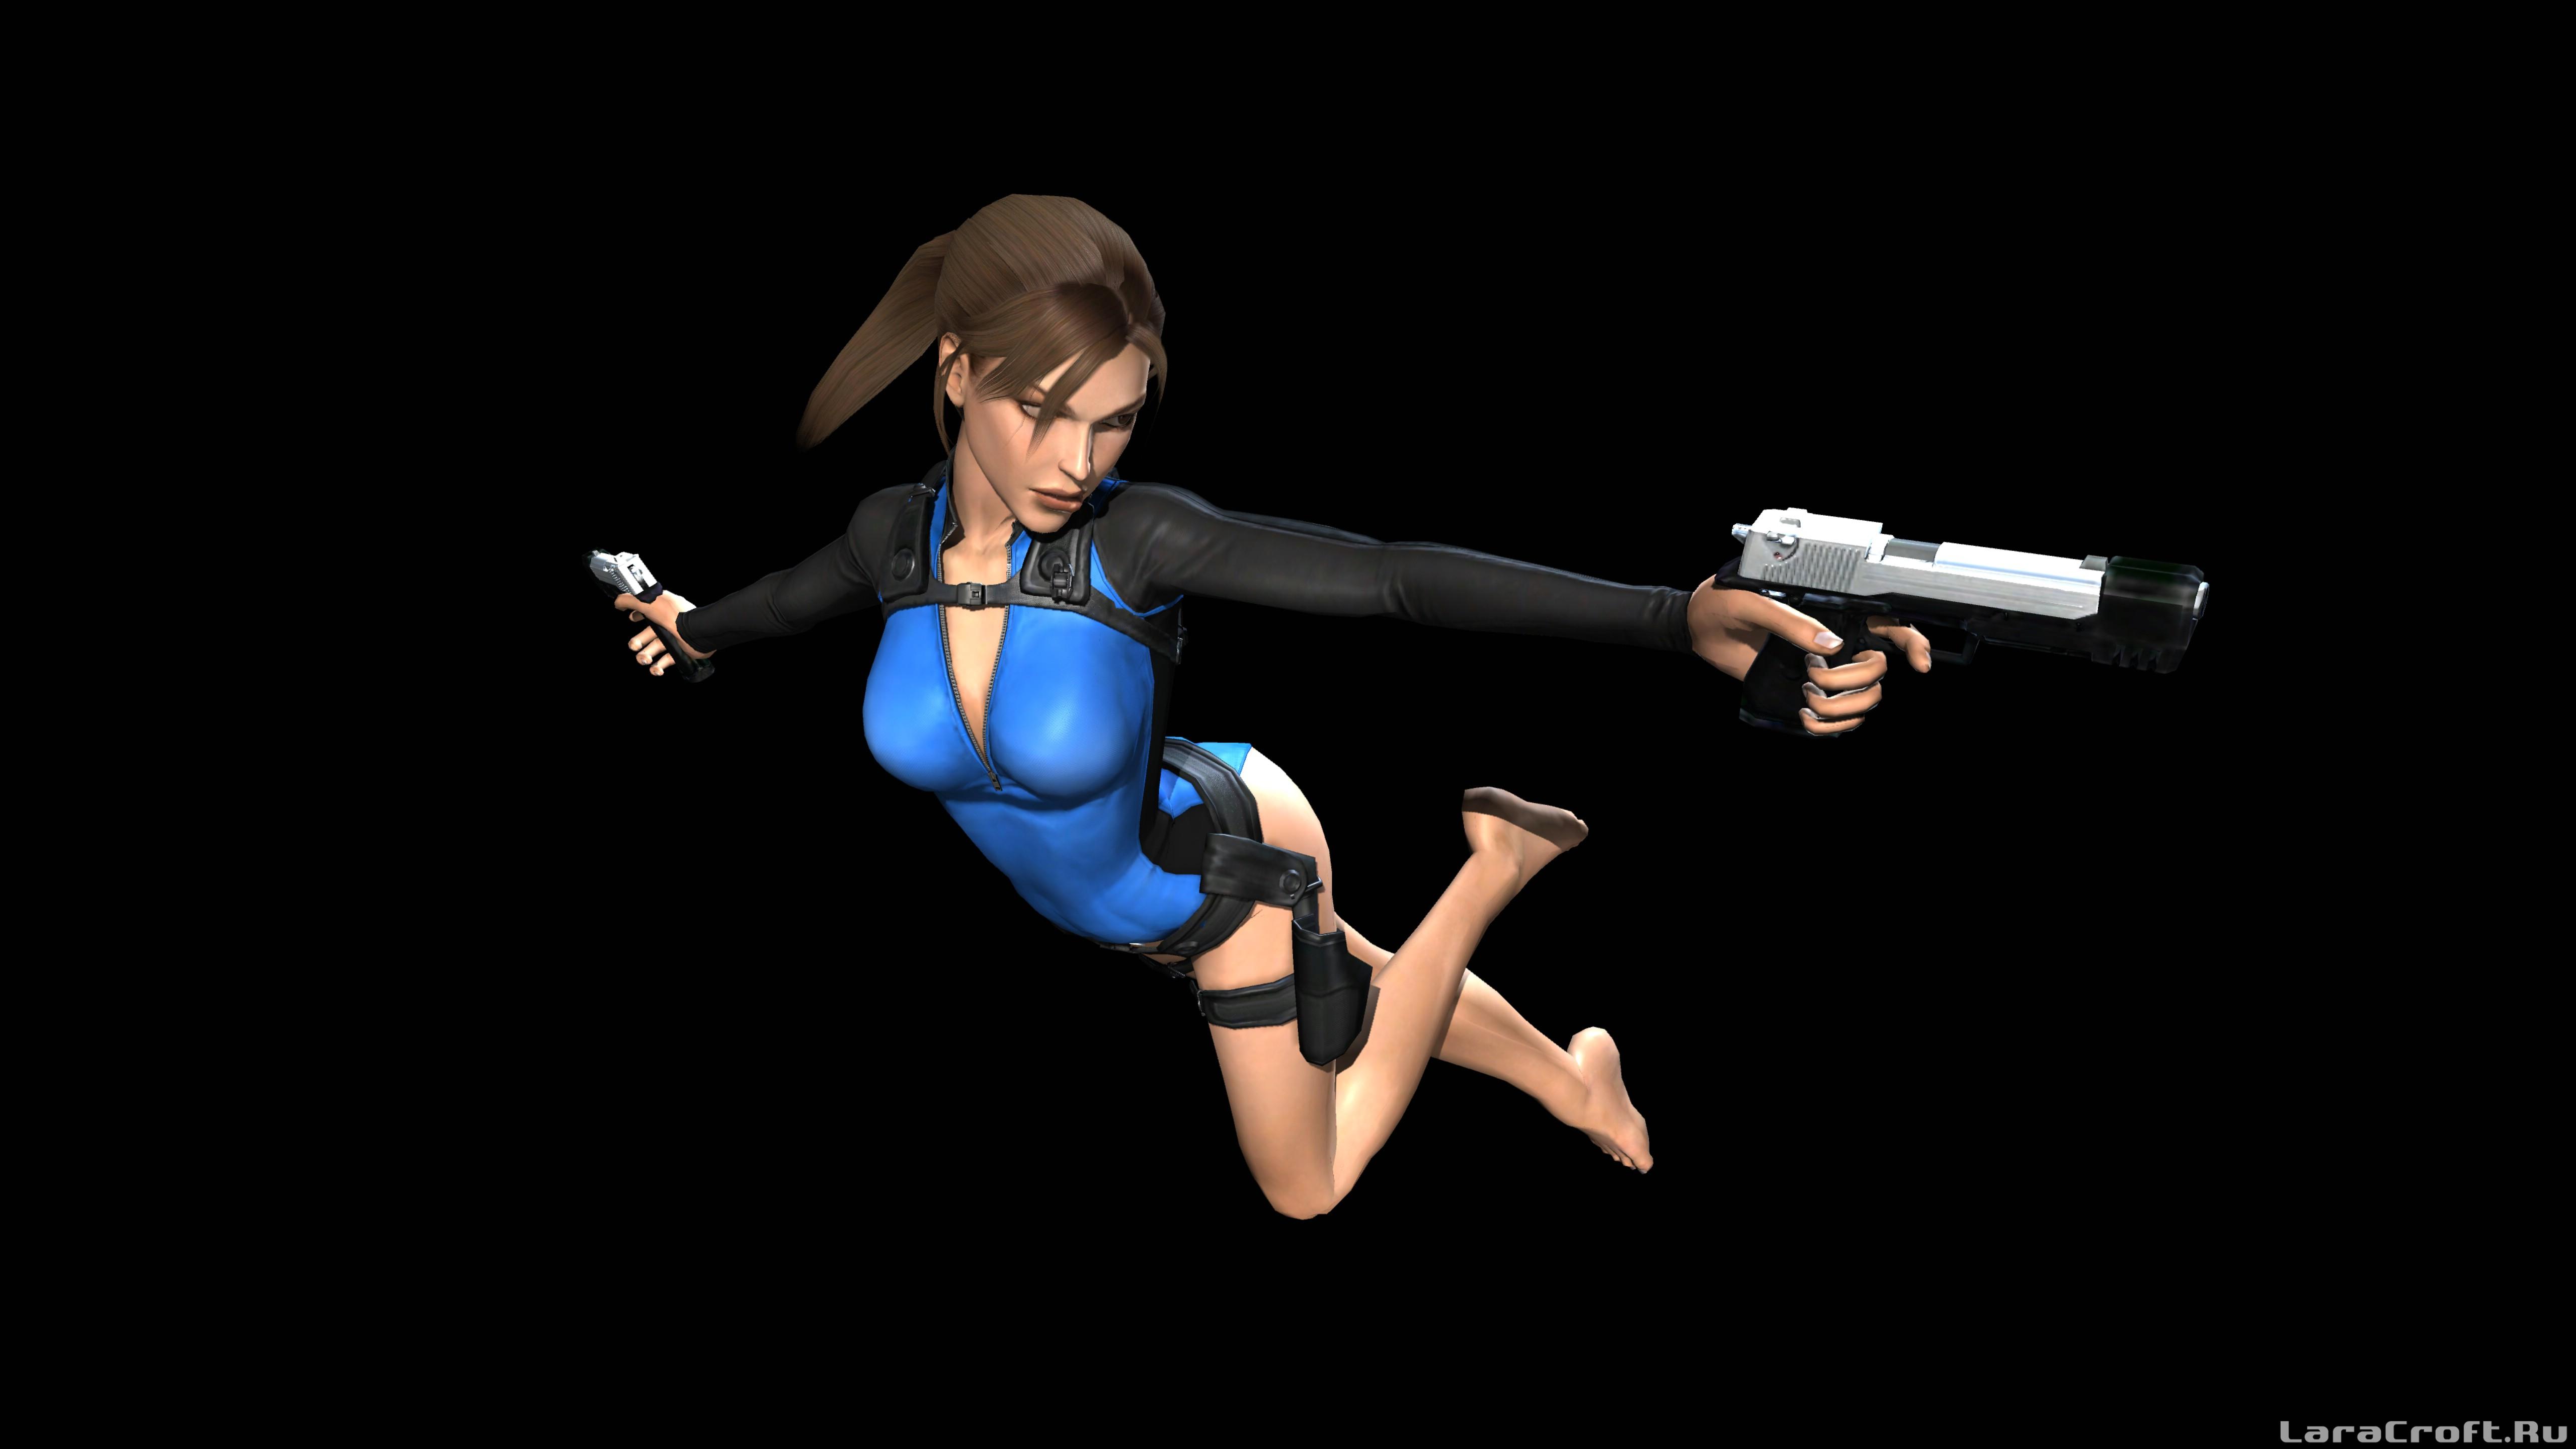 Lara croft mod pack nackt image